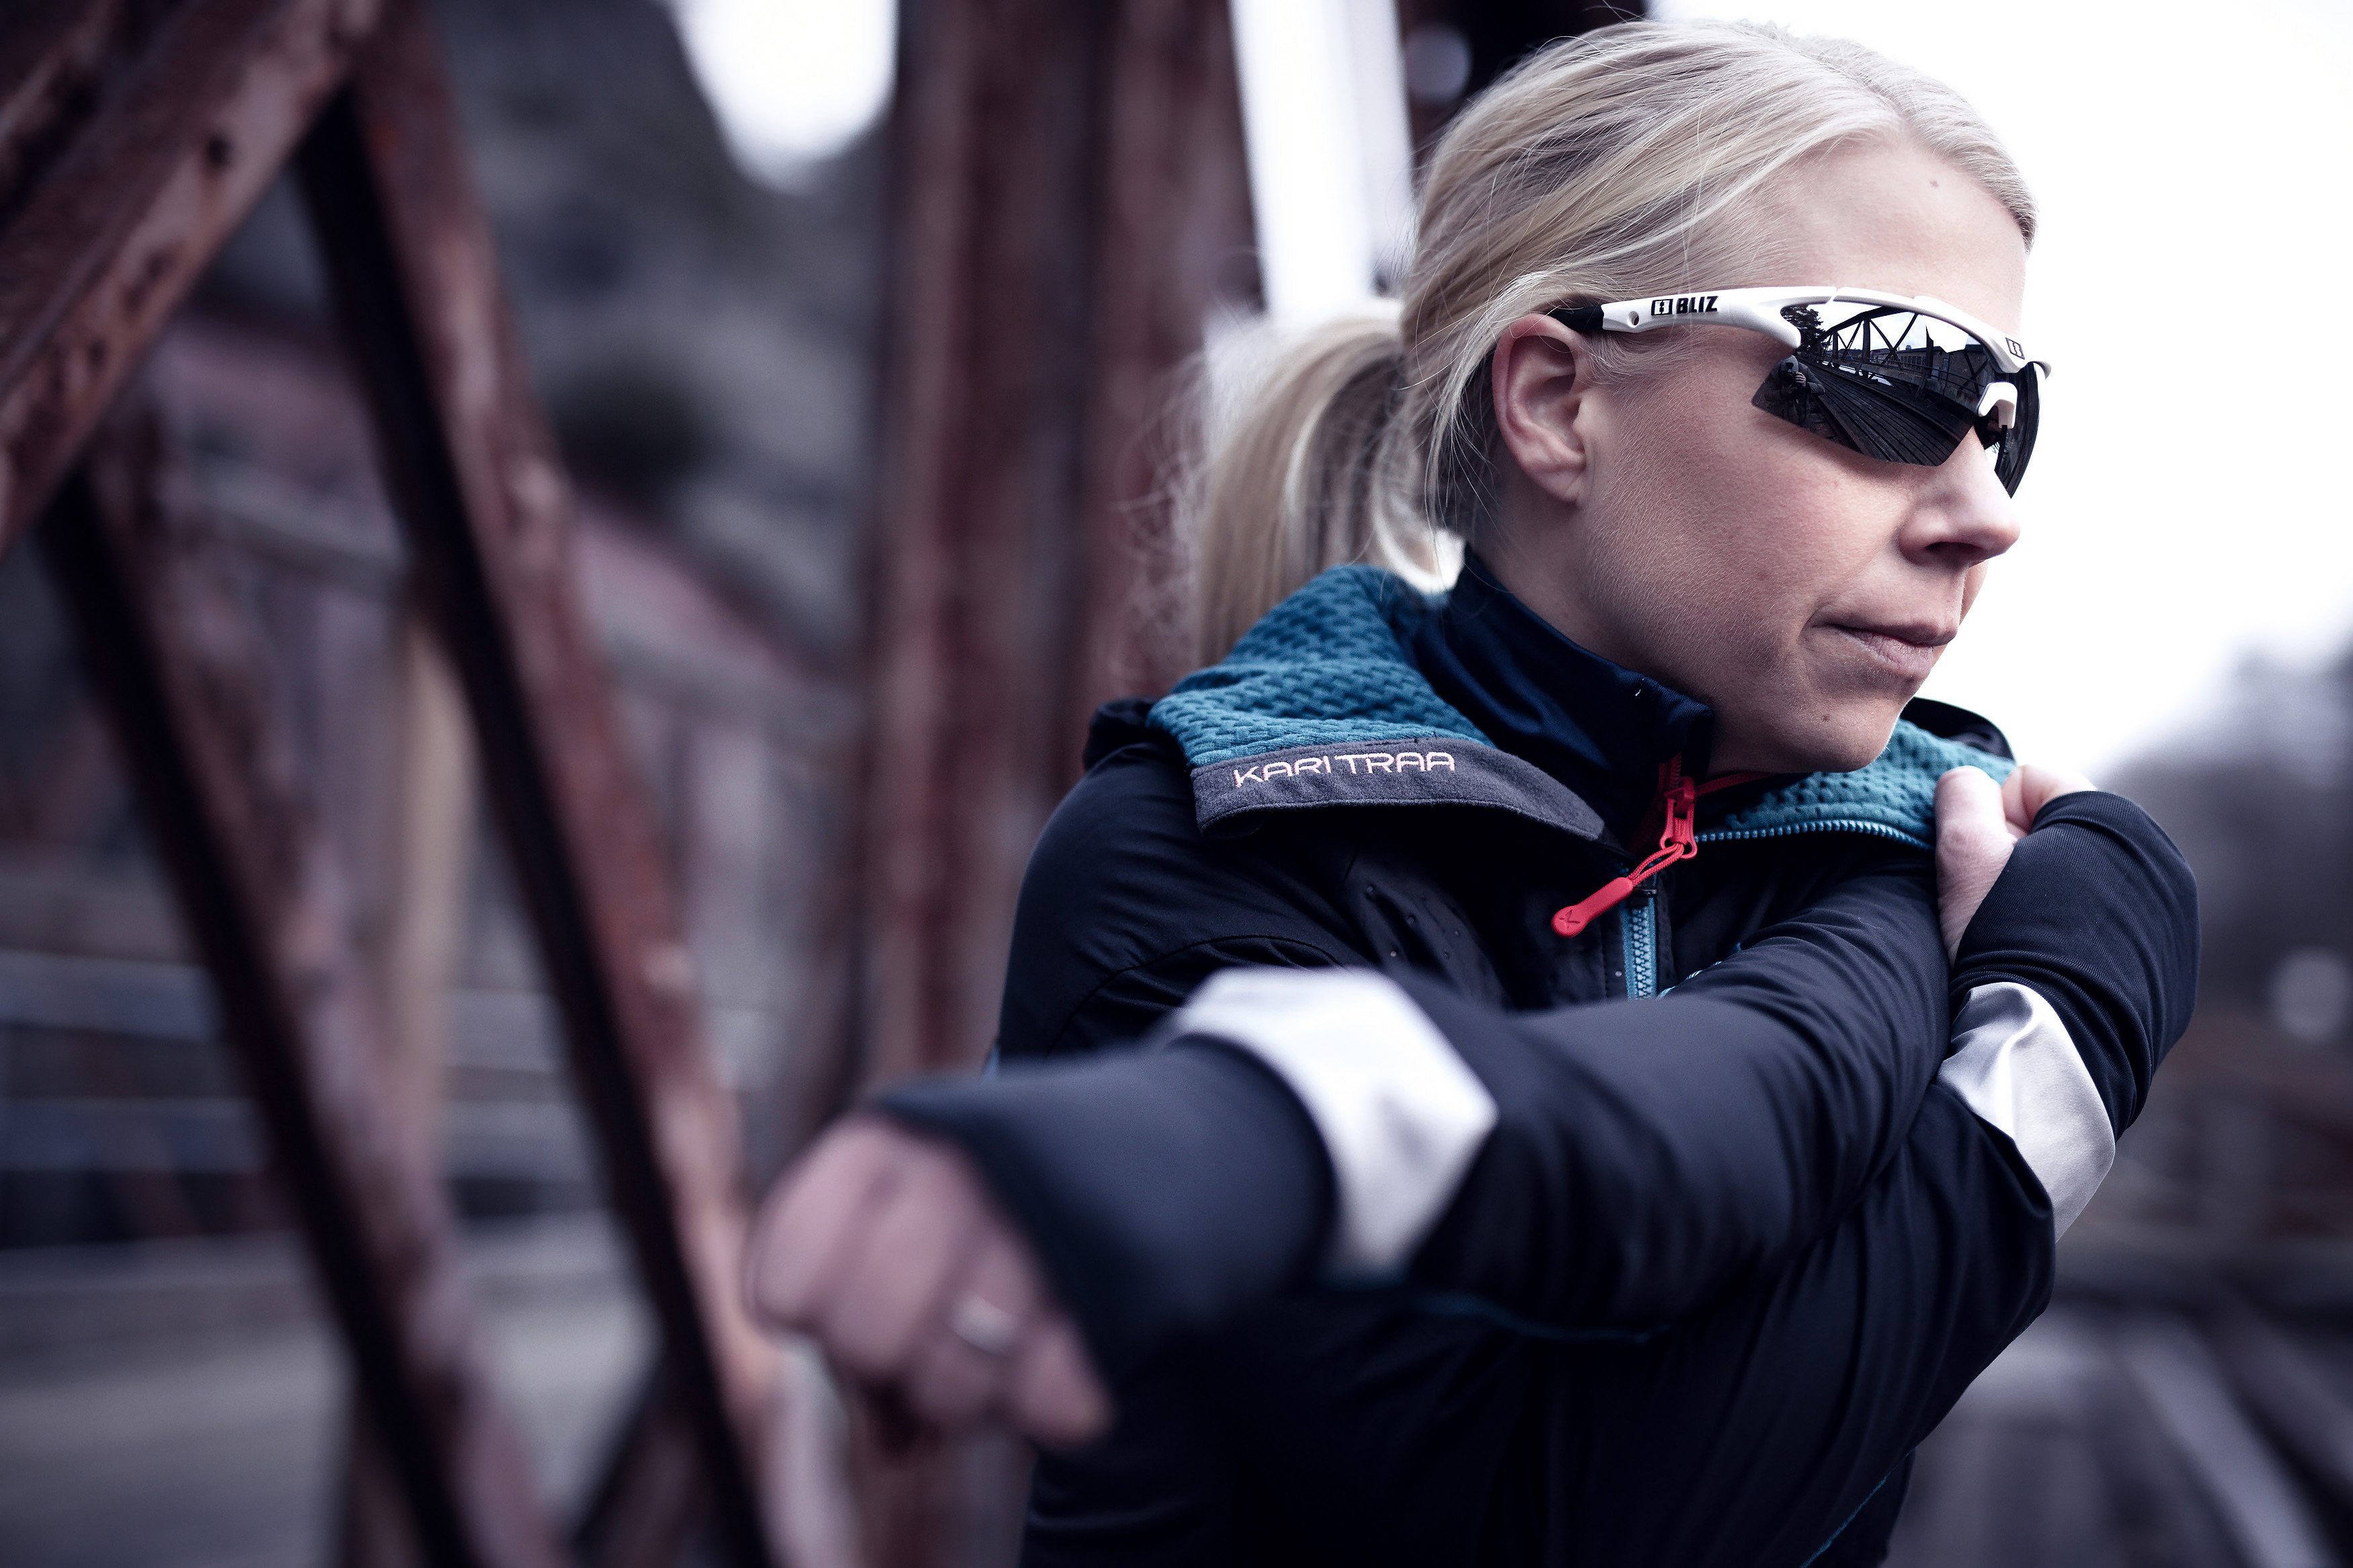 9021-01-tempo-bliz-sunglasses-running-white-sportsglasses-lifestyle2.jpg